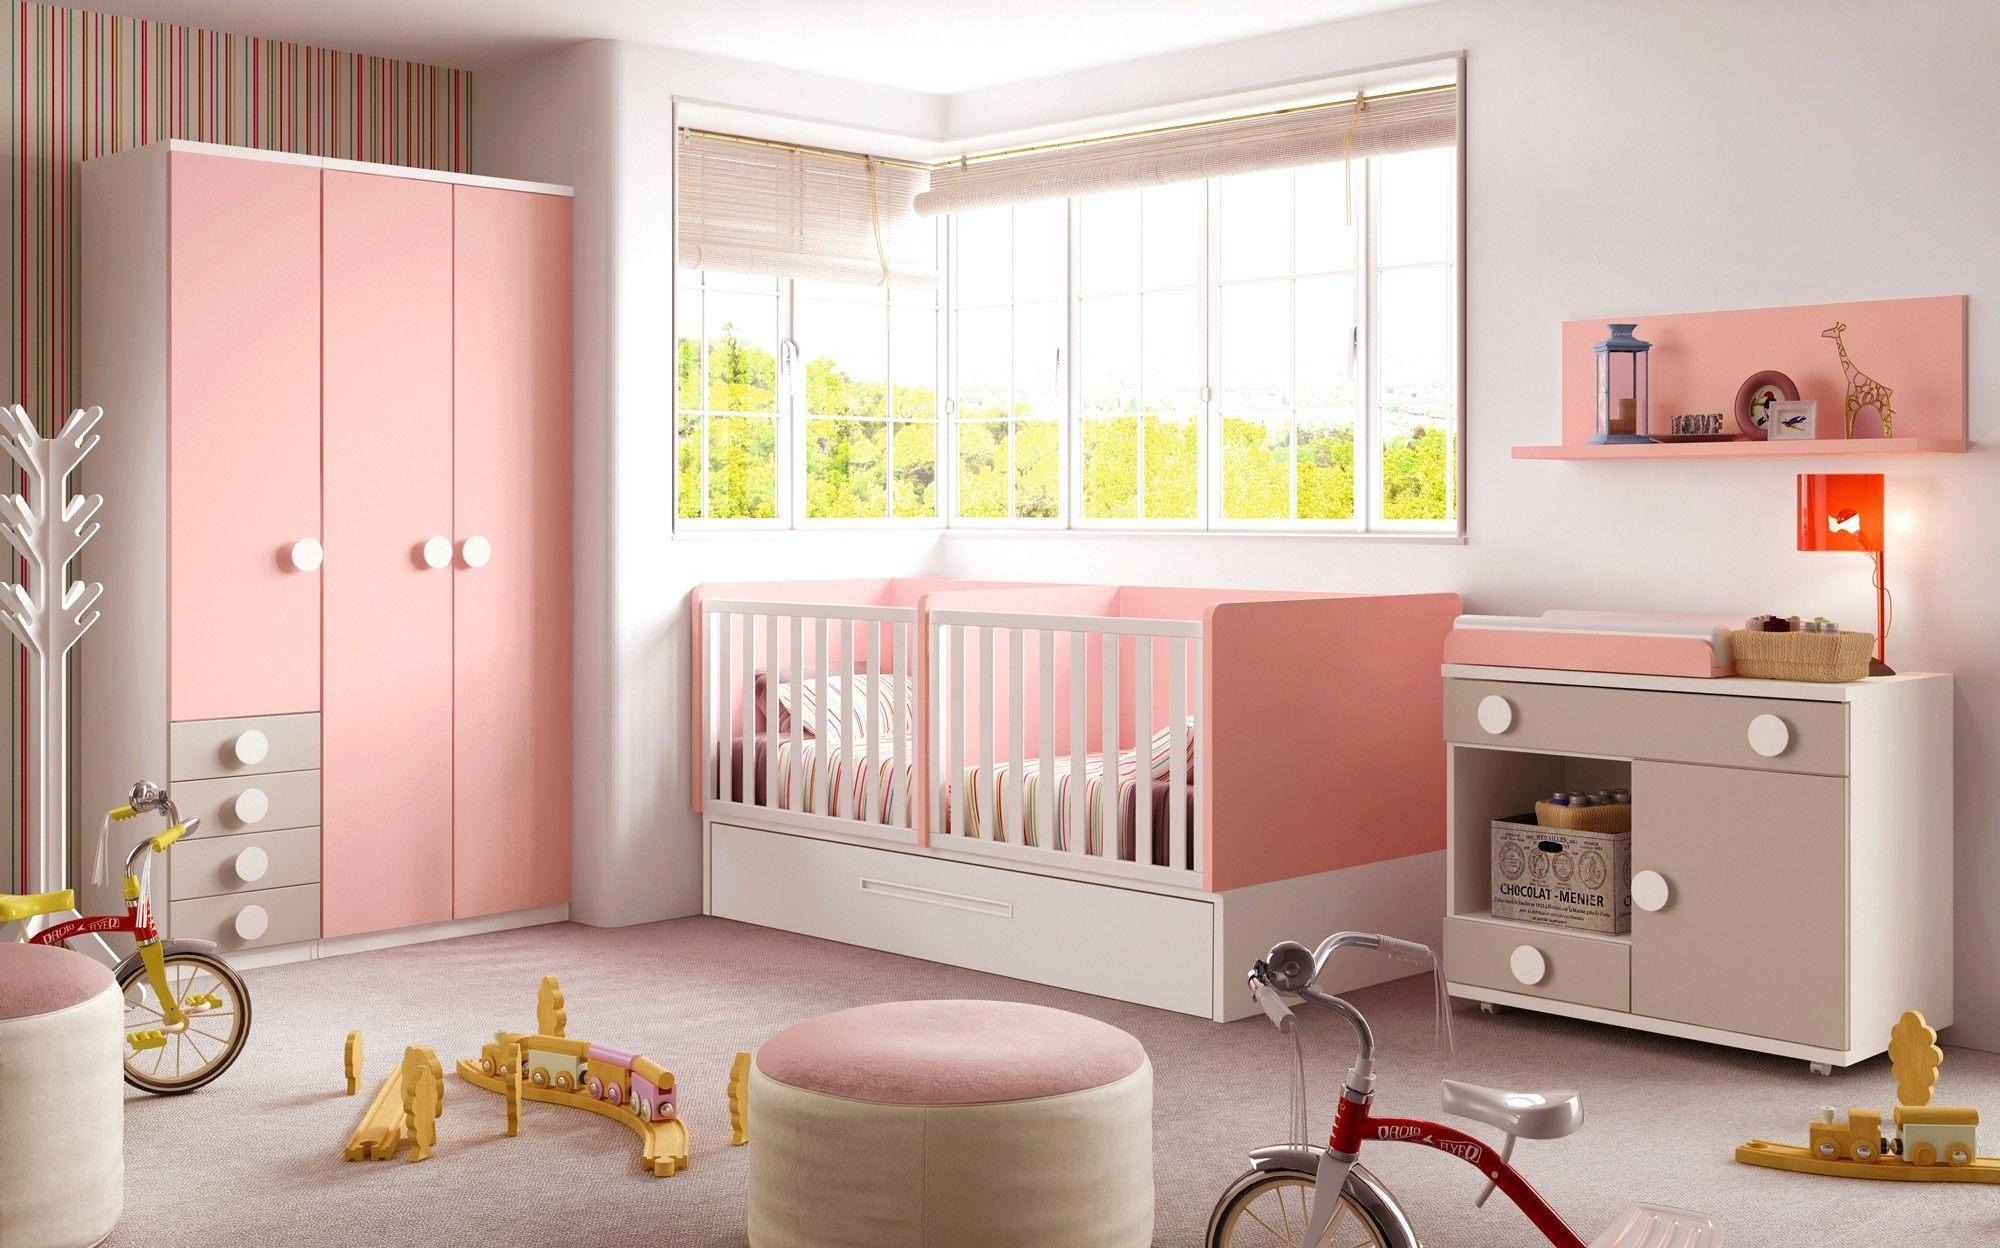 Lit Bebe Bois Fraîche Charmant Chambre Enfant Bebe Et Chambre Bébé Bois Massif Lit Bébé